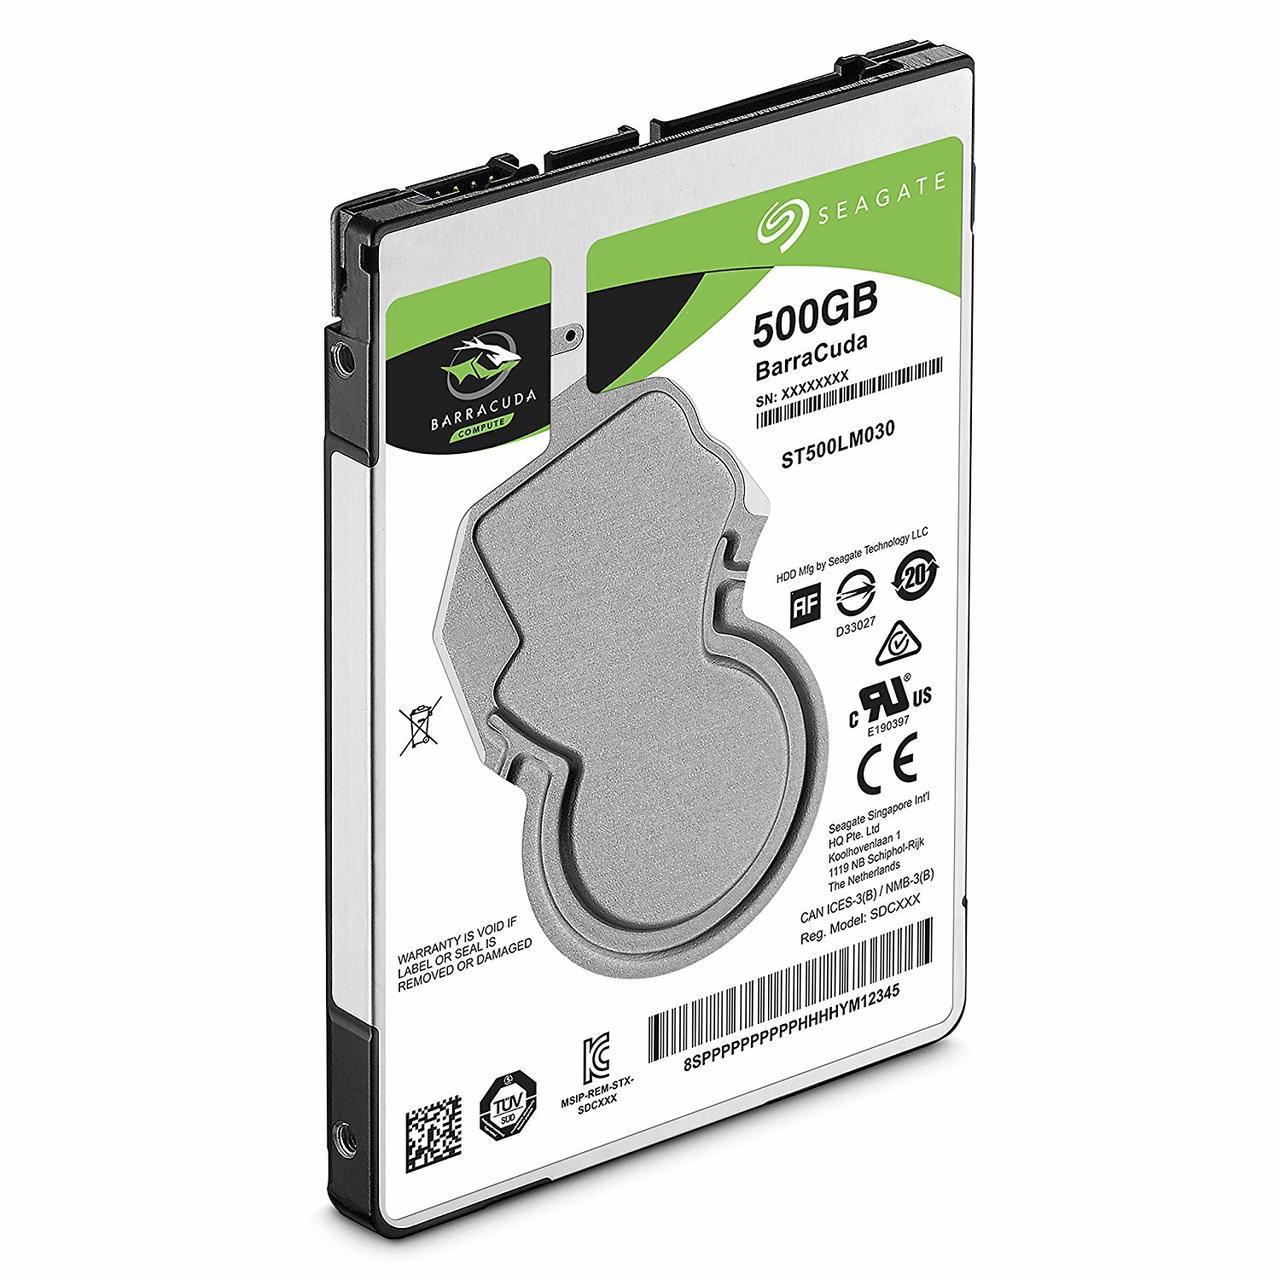 Seagate 500GB BarraCuda SATA 6Gb/s 128MB Cache 2.5-Inch 7mm Internal Hard Drive (ST500LM030)